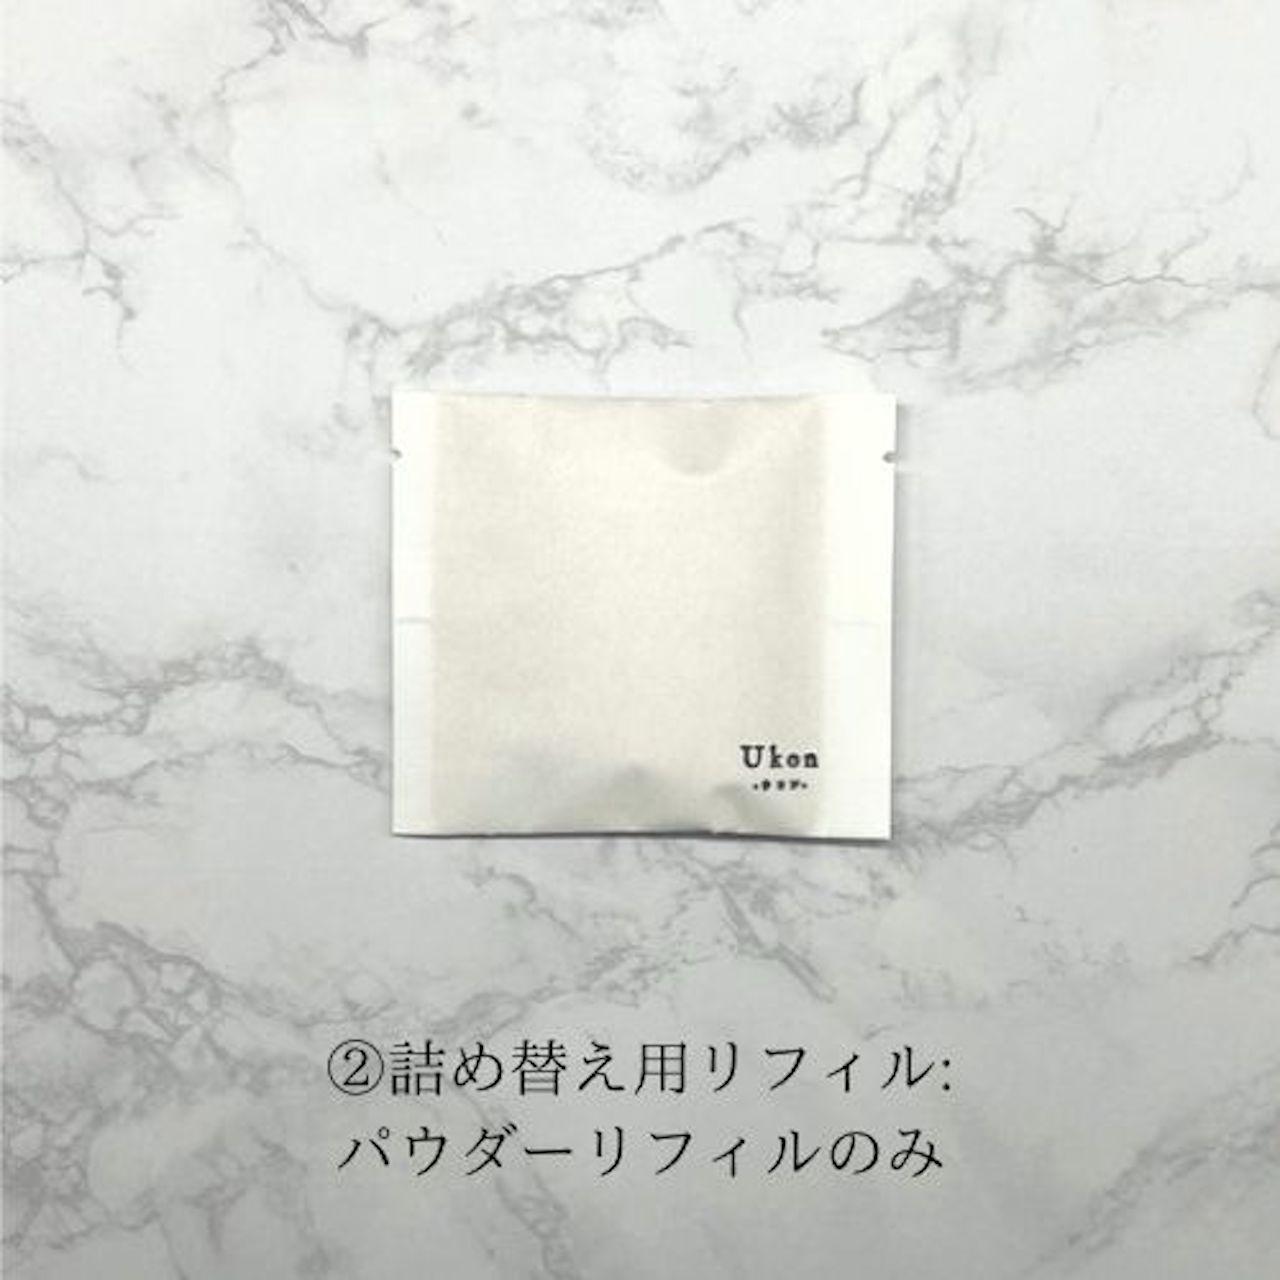 ★【Black Label】 国産ウコンパウダー